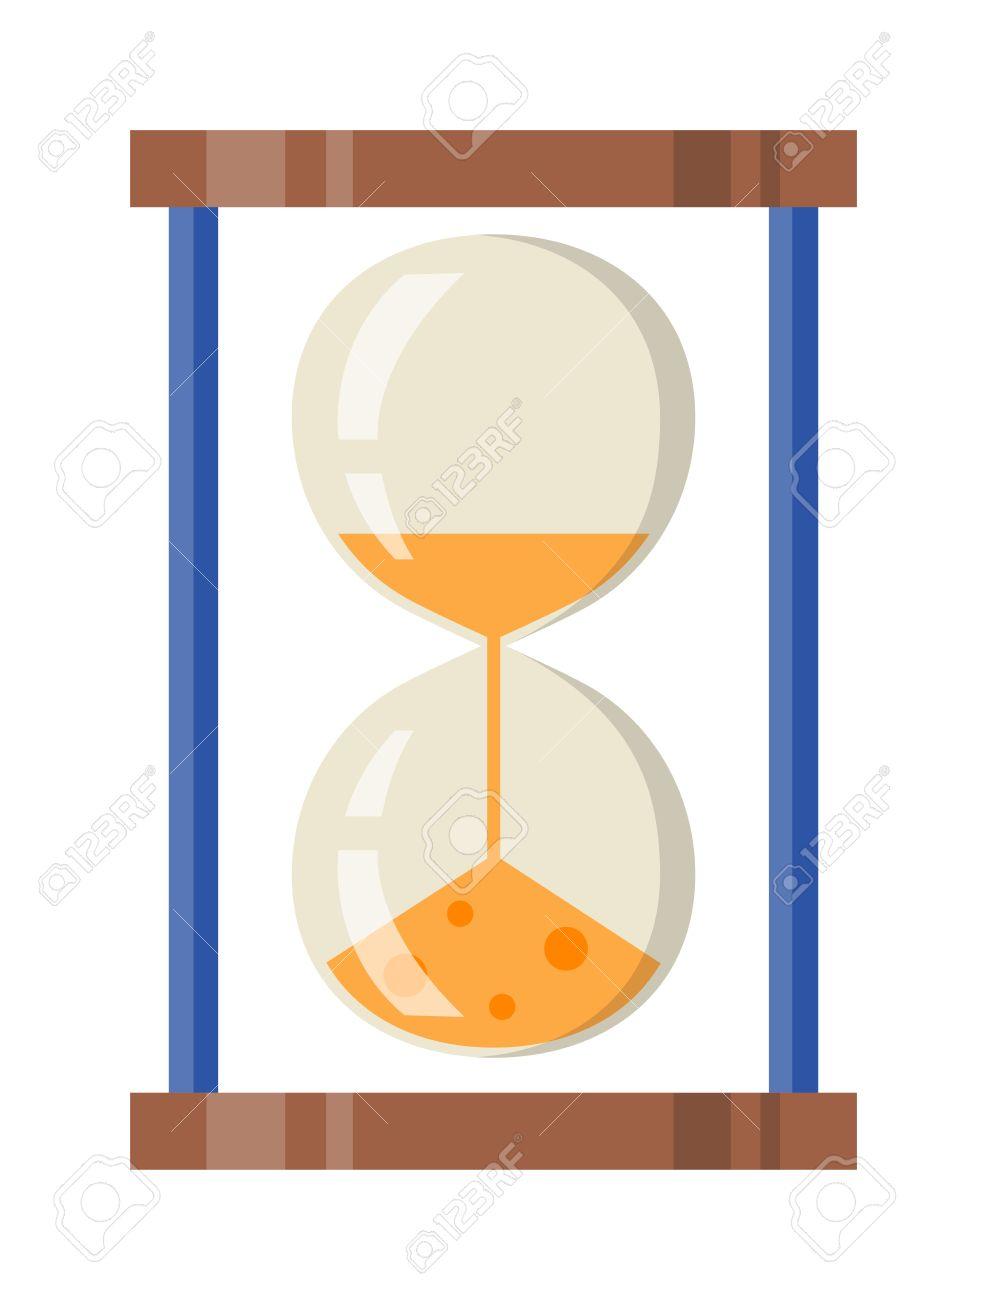 Sandglass icon  Transparent Sandglass Icon, Time Hourglass, Sand Clock Flat Design ...